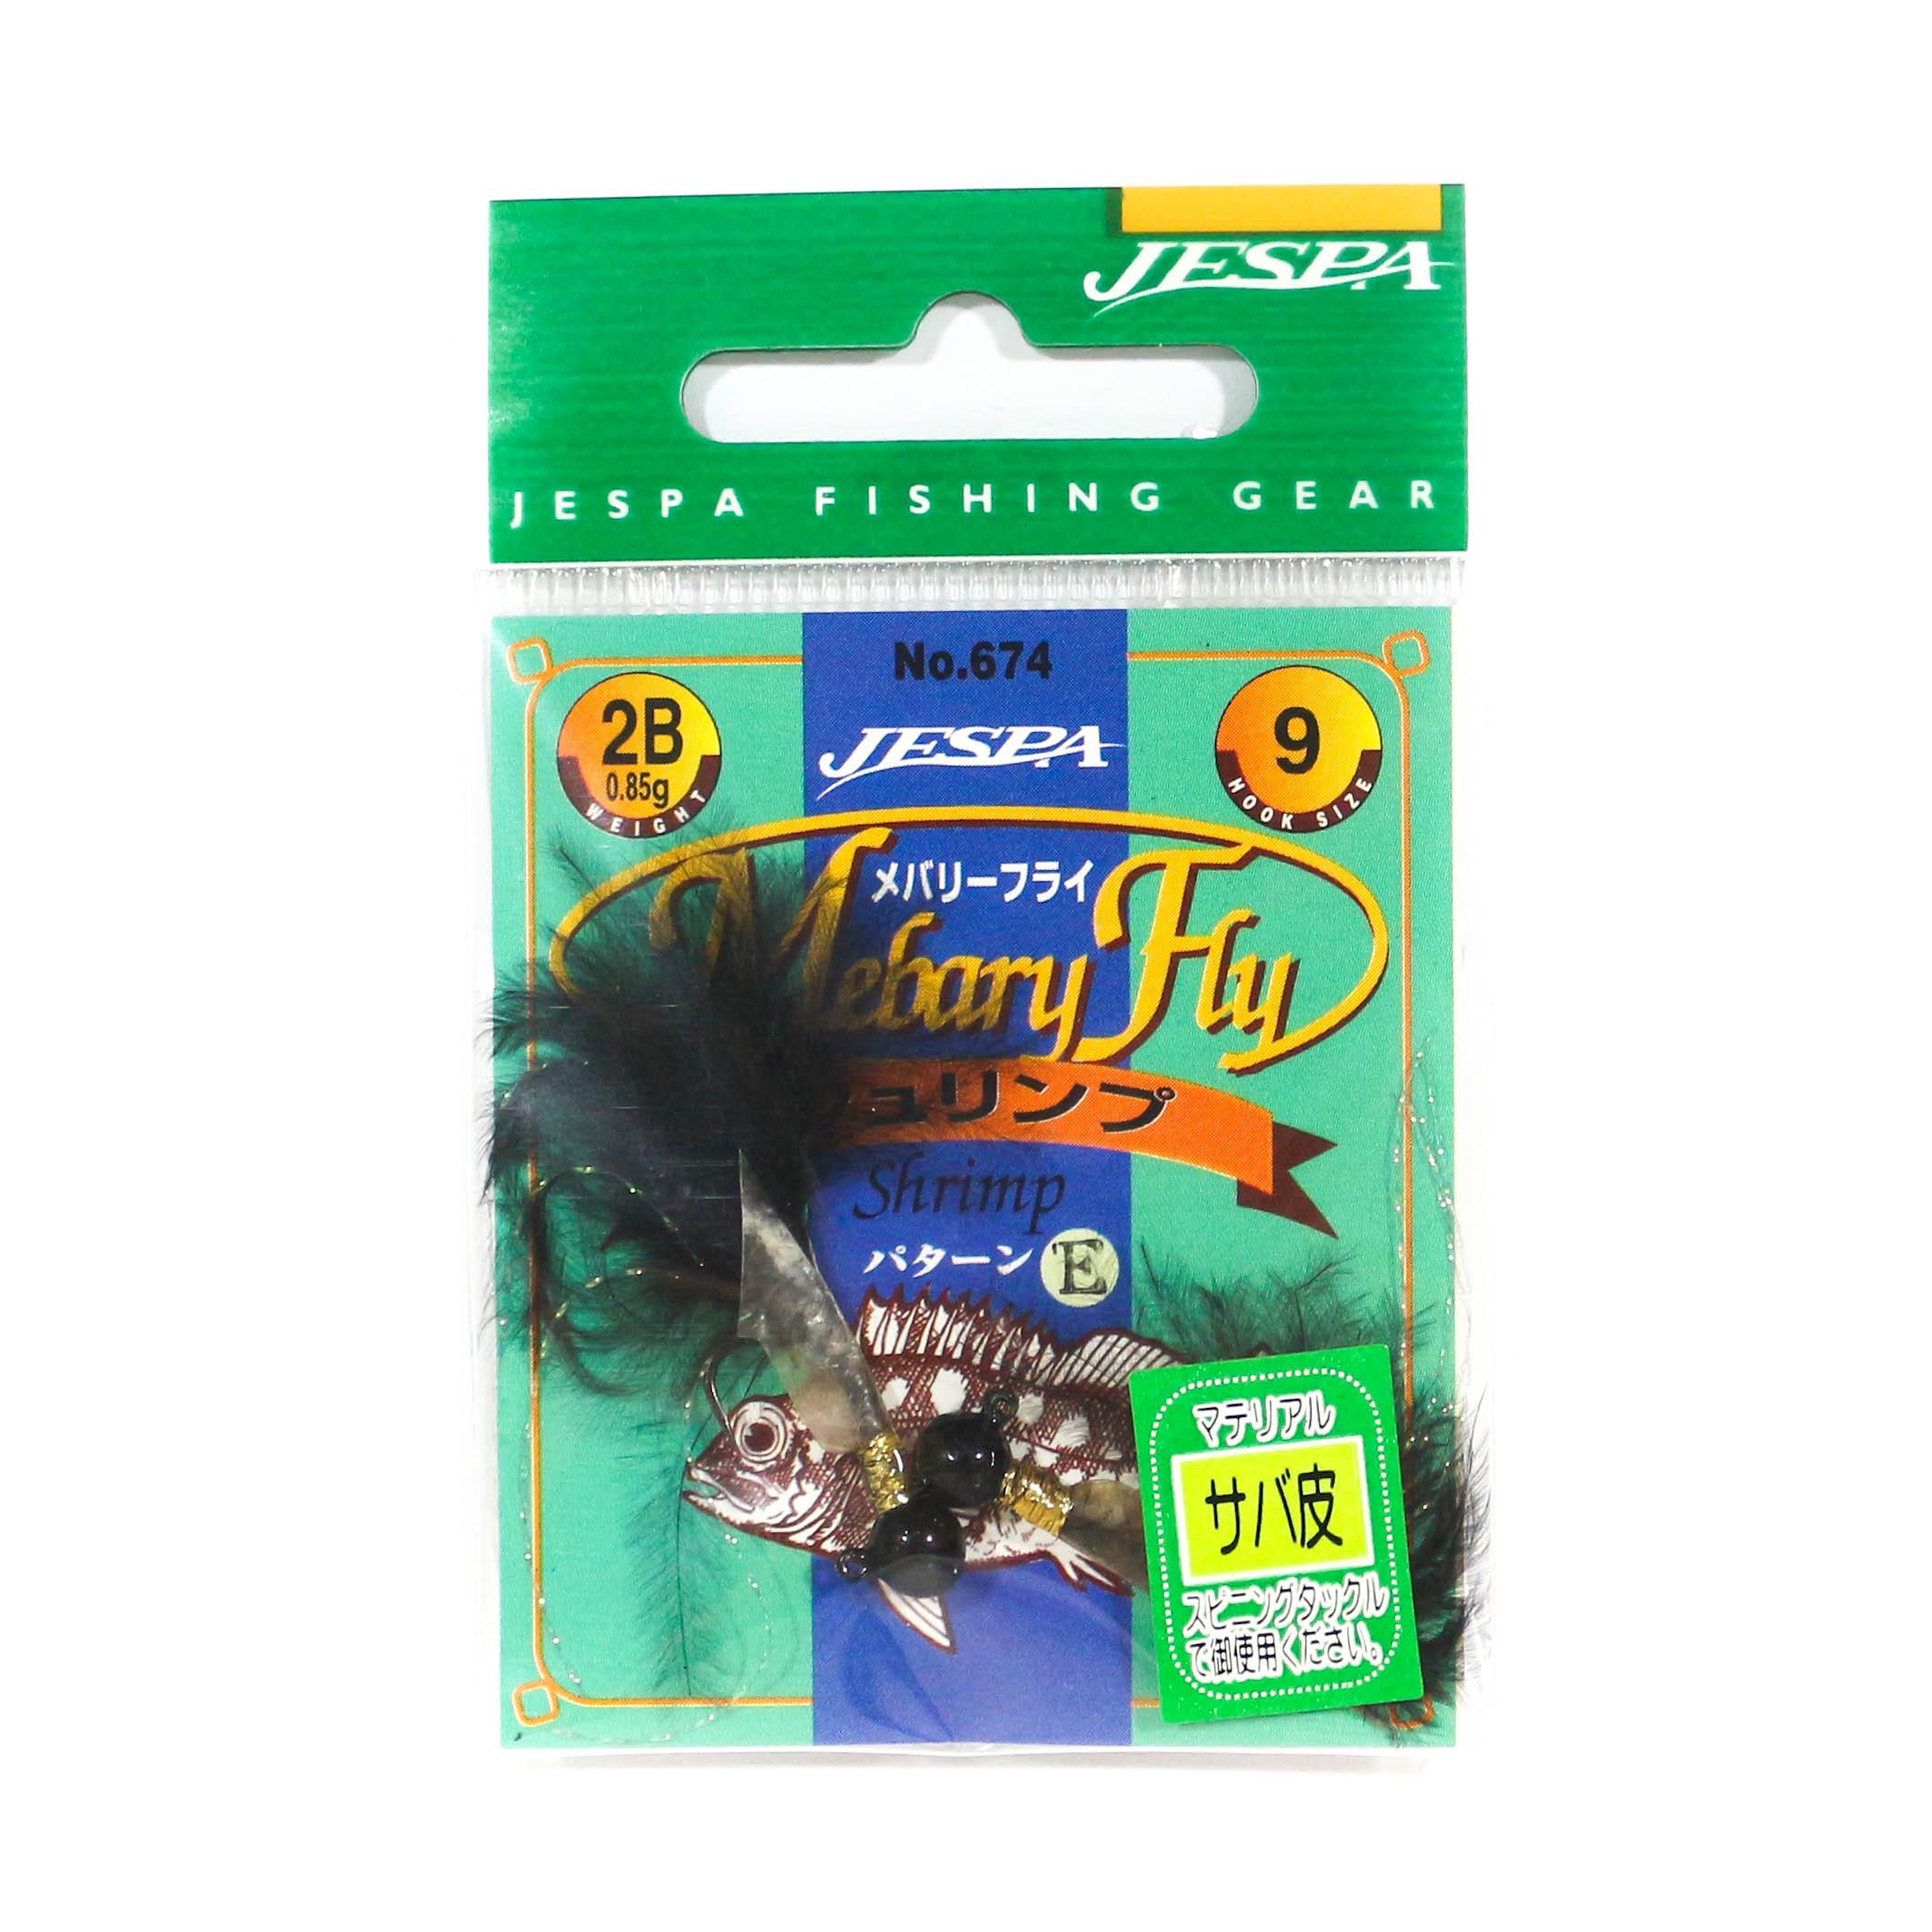 Yarie Jespa M. 674 Mebaru Fly Jig Head 2 per pack Black 0.85 gram Size 9 (1548)